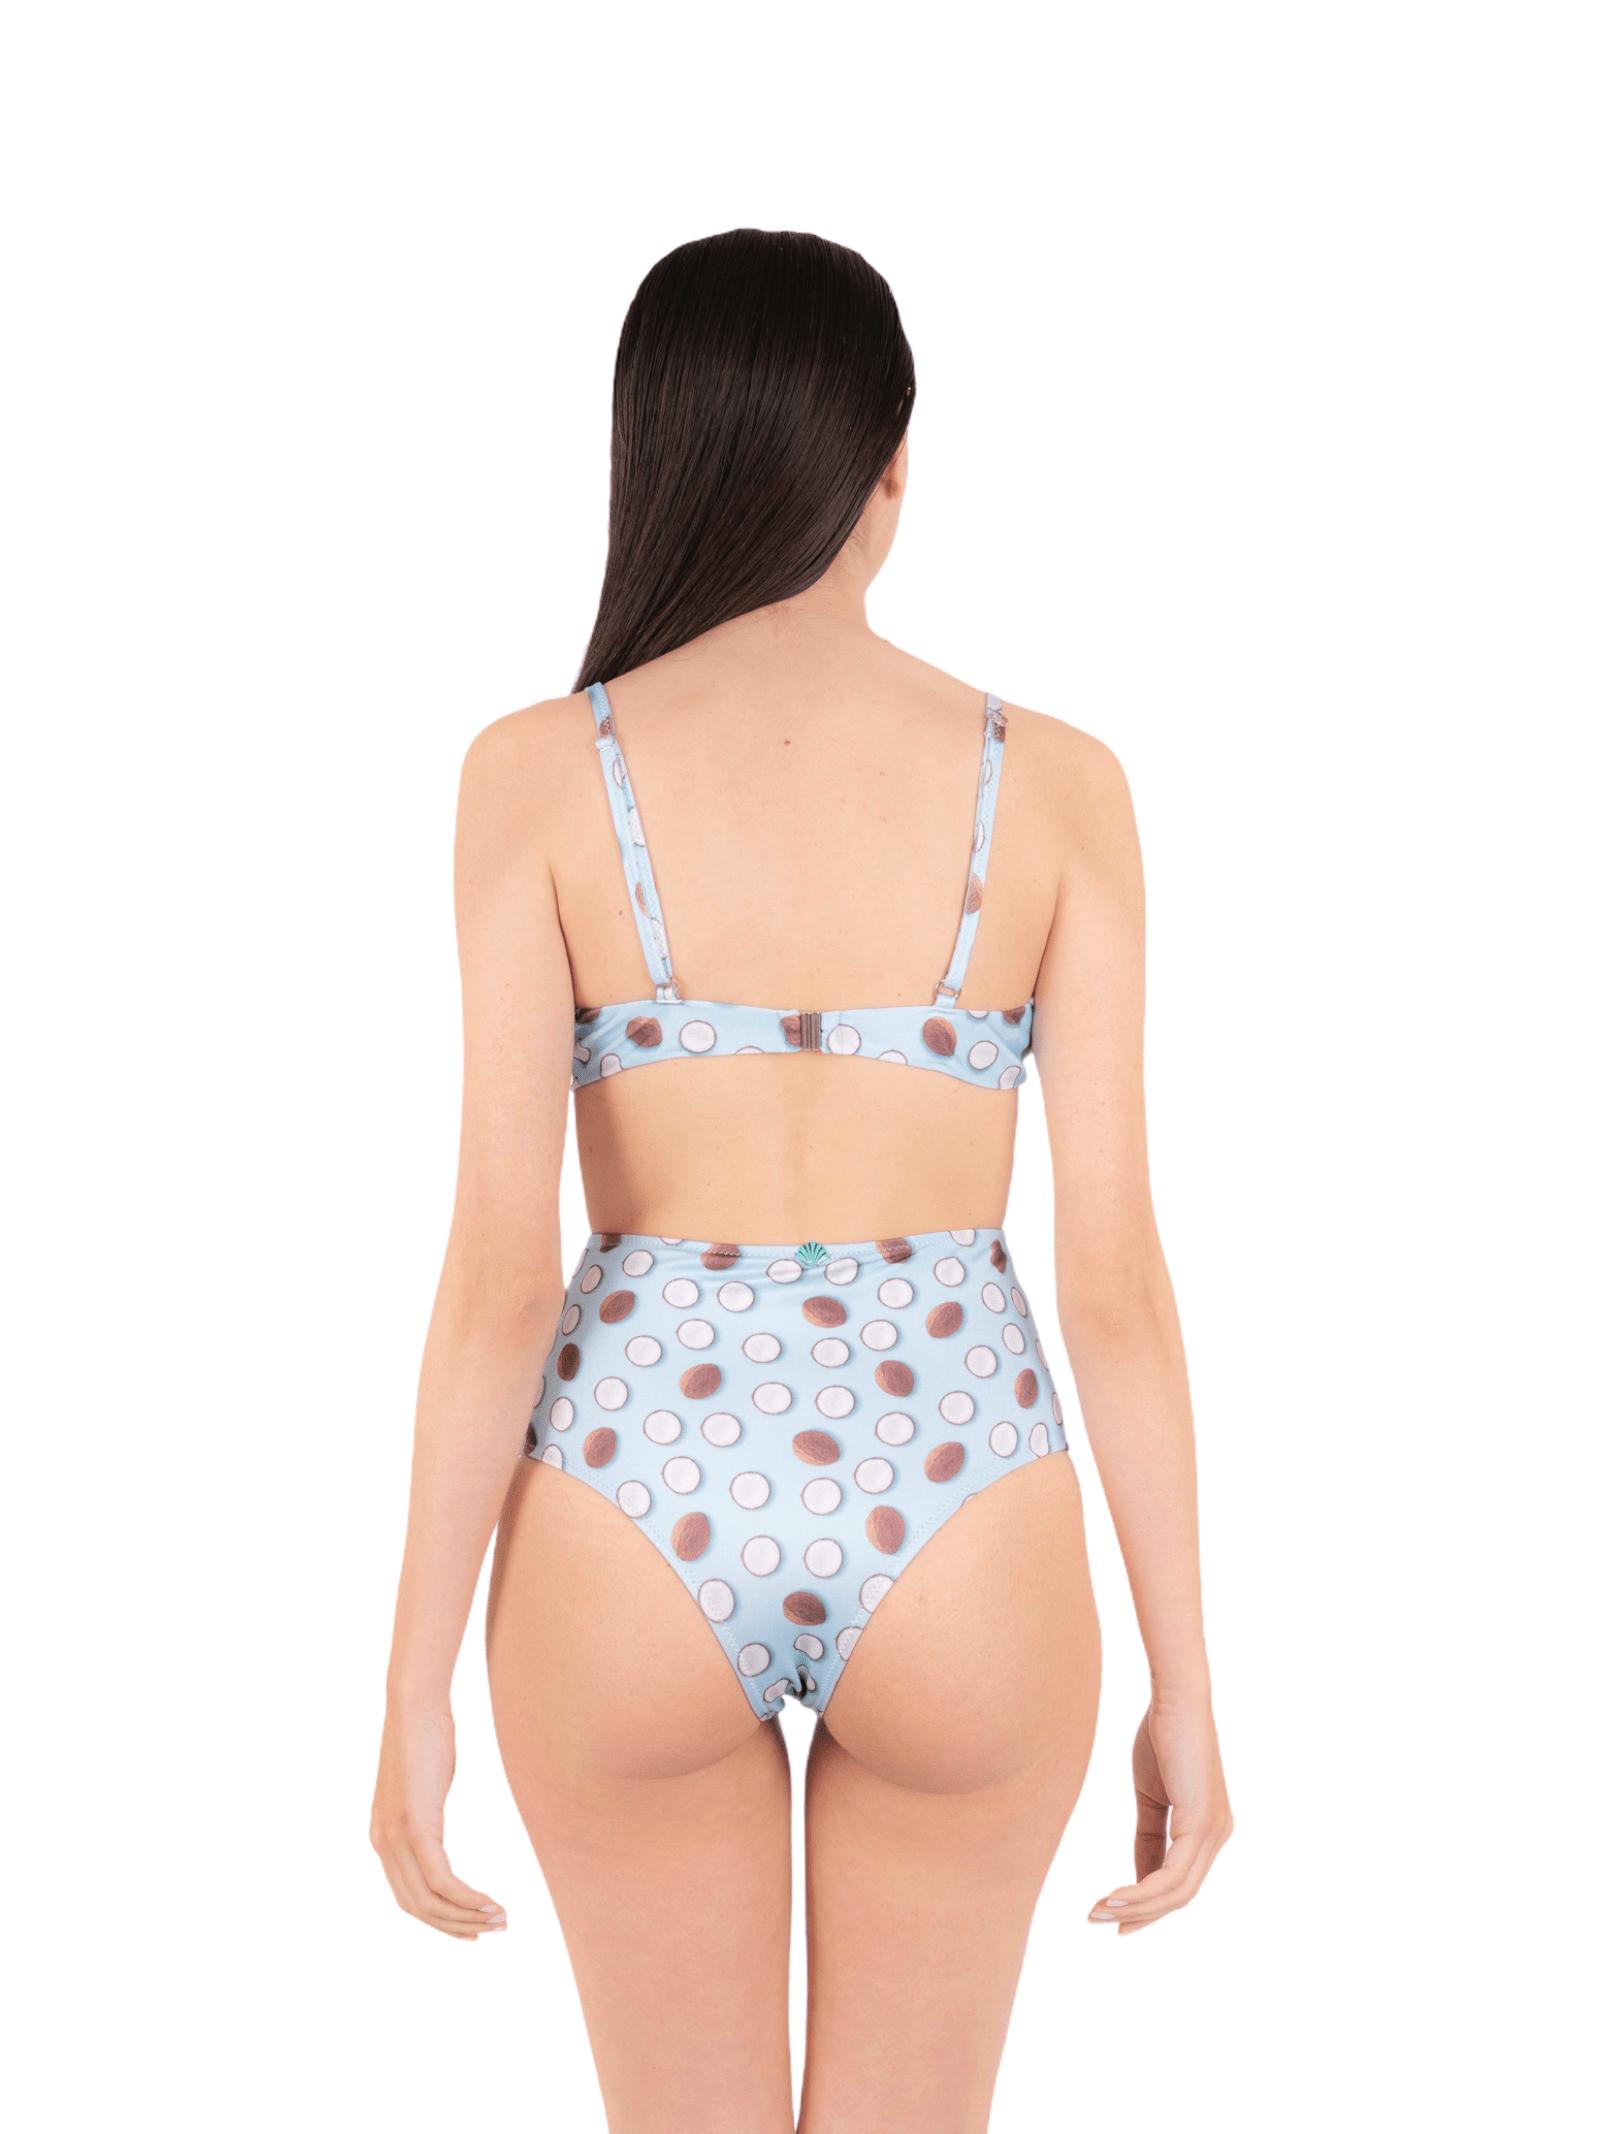 Bikini push-up with high slip ANNAMARE | 23 | BK-123CELESTE